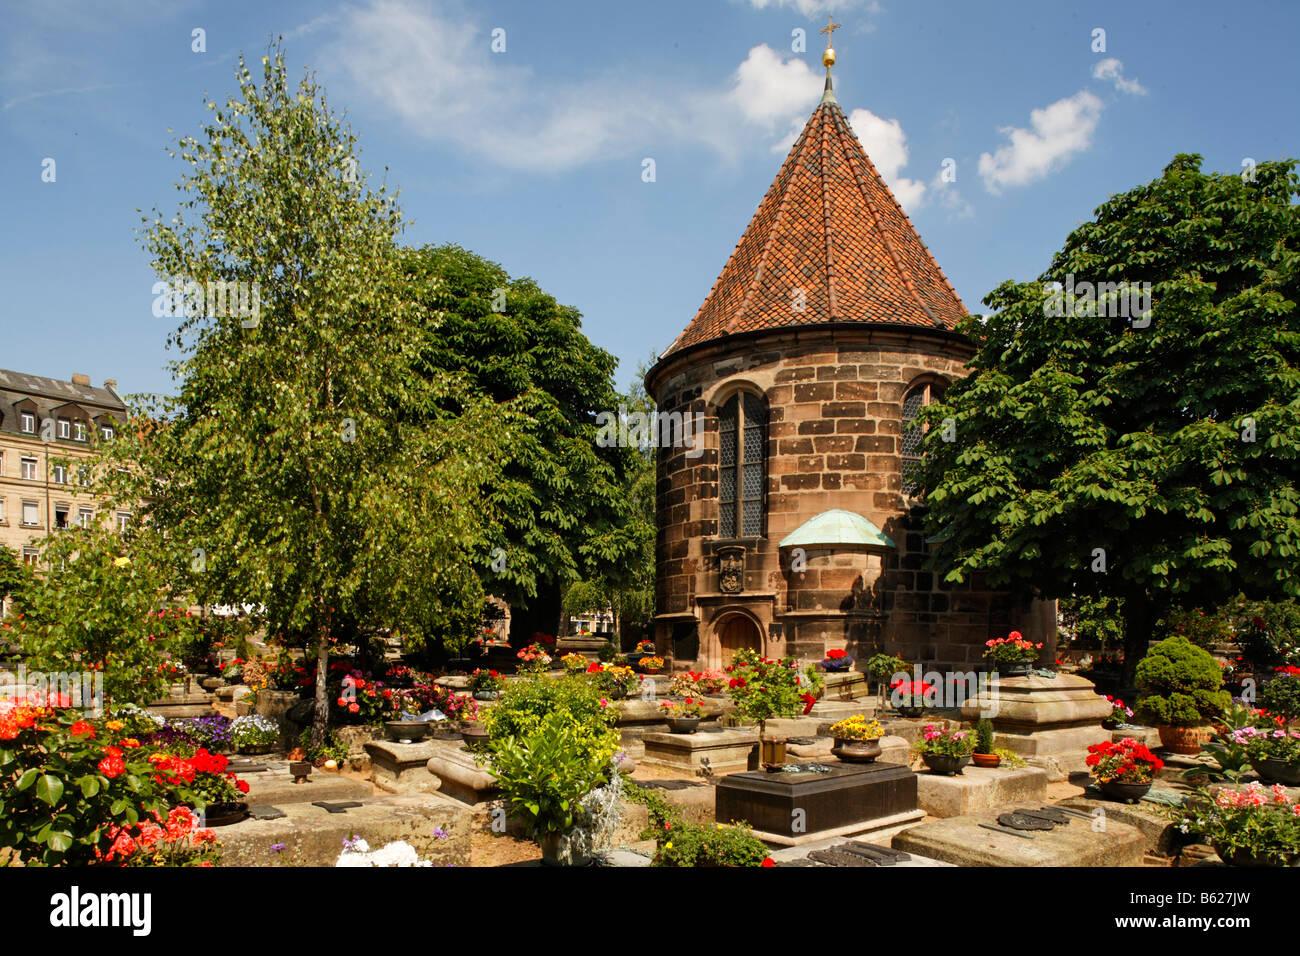 Johannis graveyard, St. Johannis area, Nuremberg, Middle Franconia, Bavaria, Germany, Europe Stock Photo